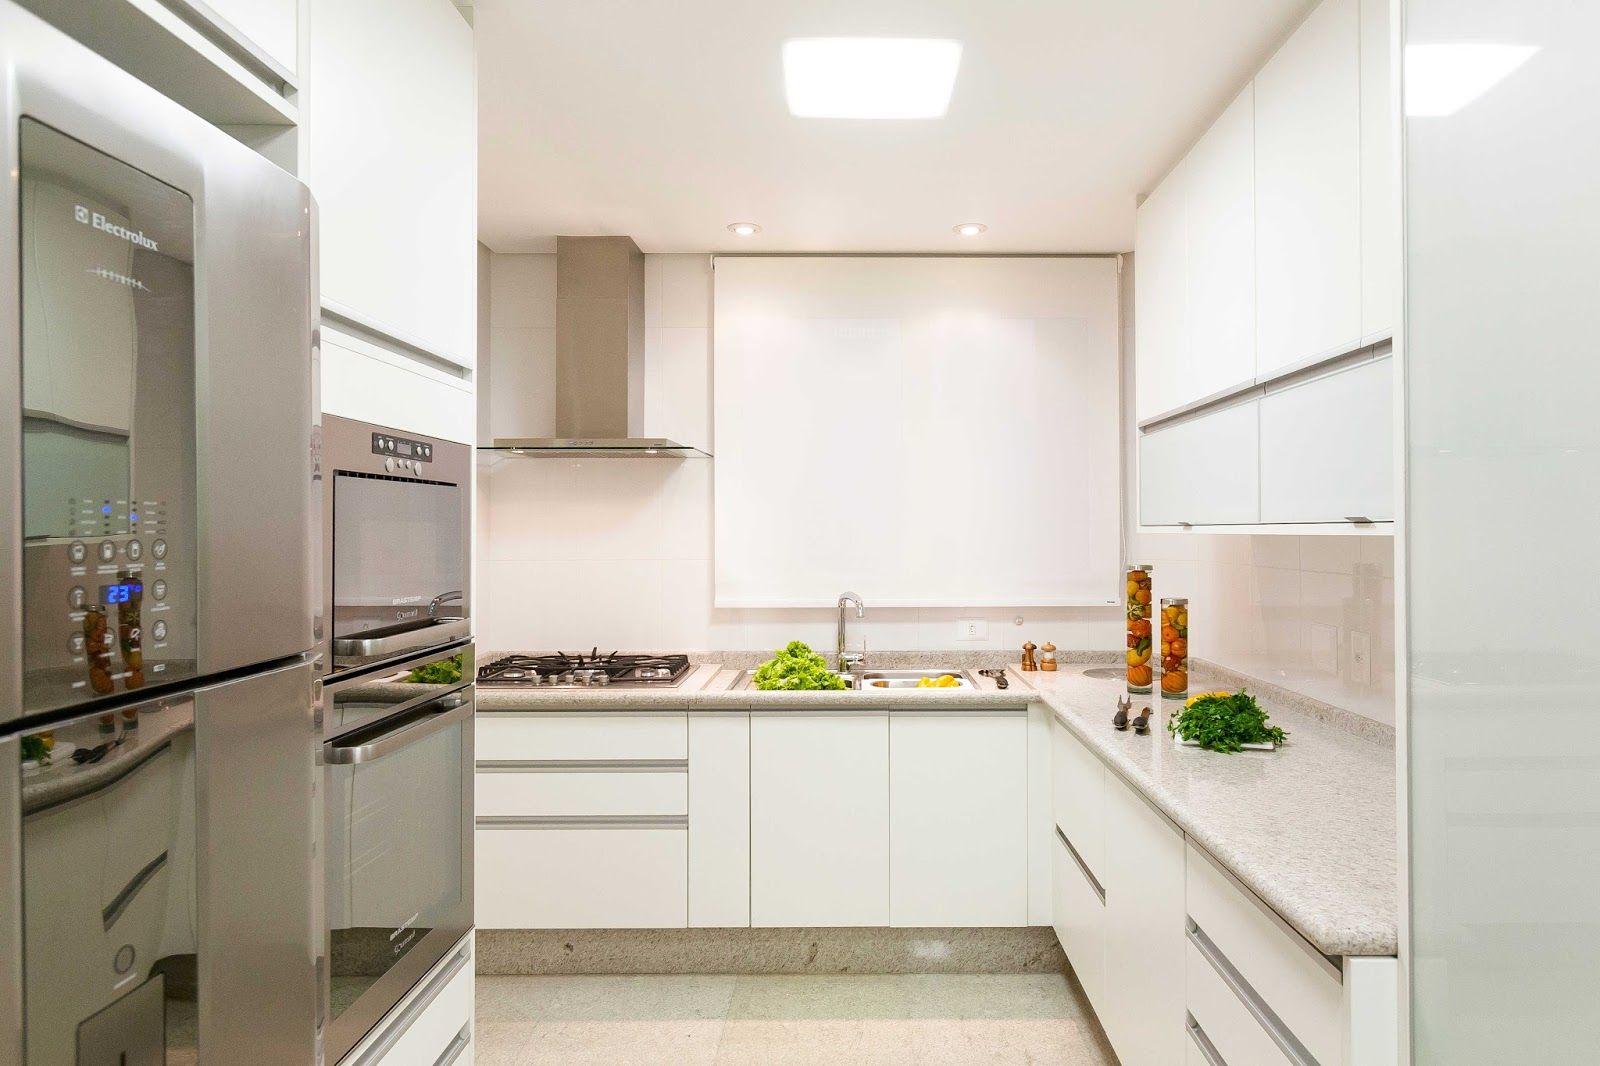 how to design wet dry kitchen - Google Search | Interior Design ...